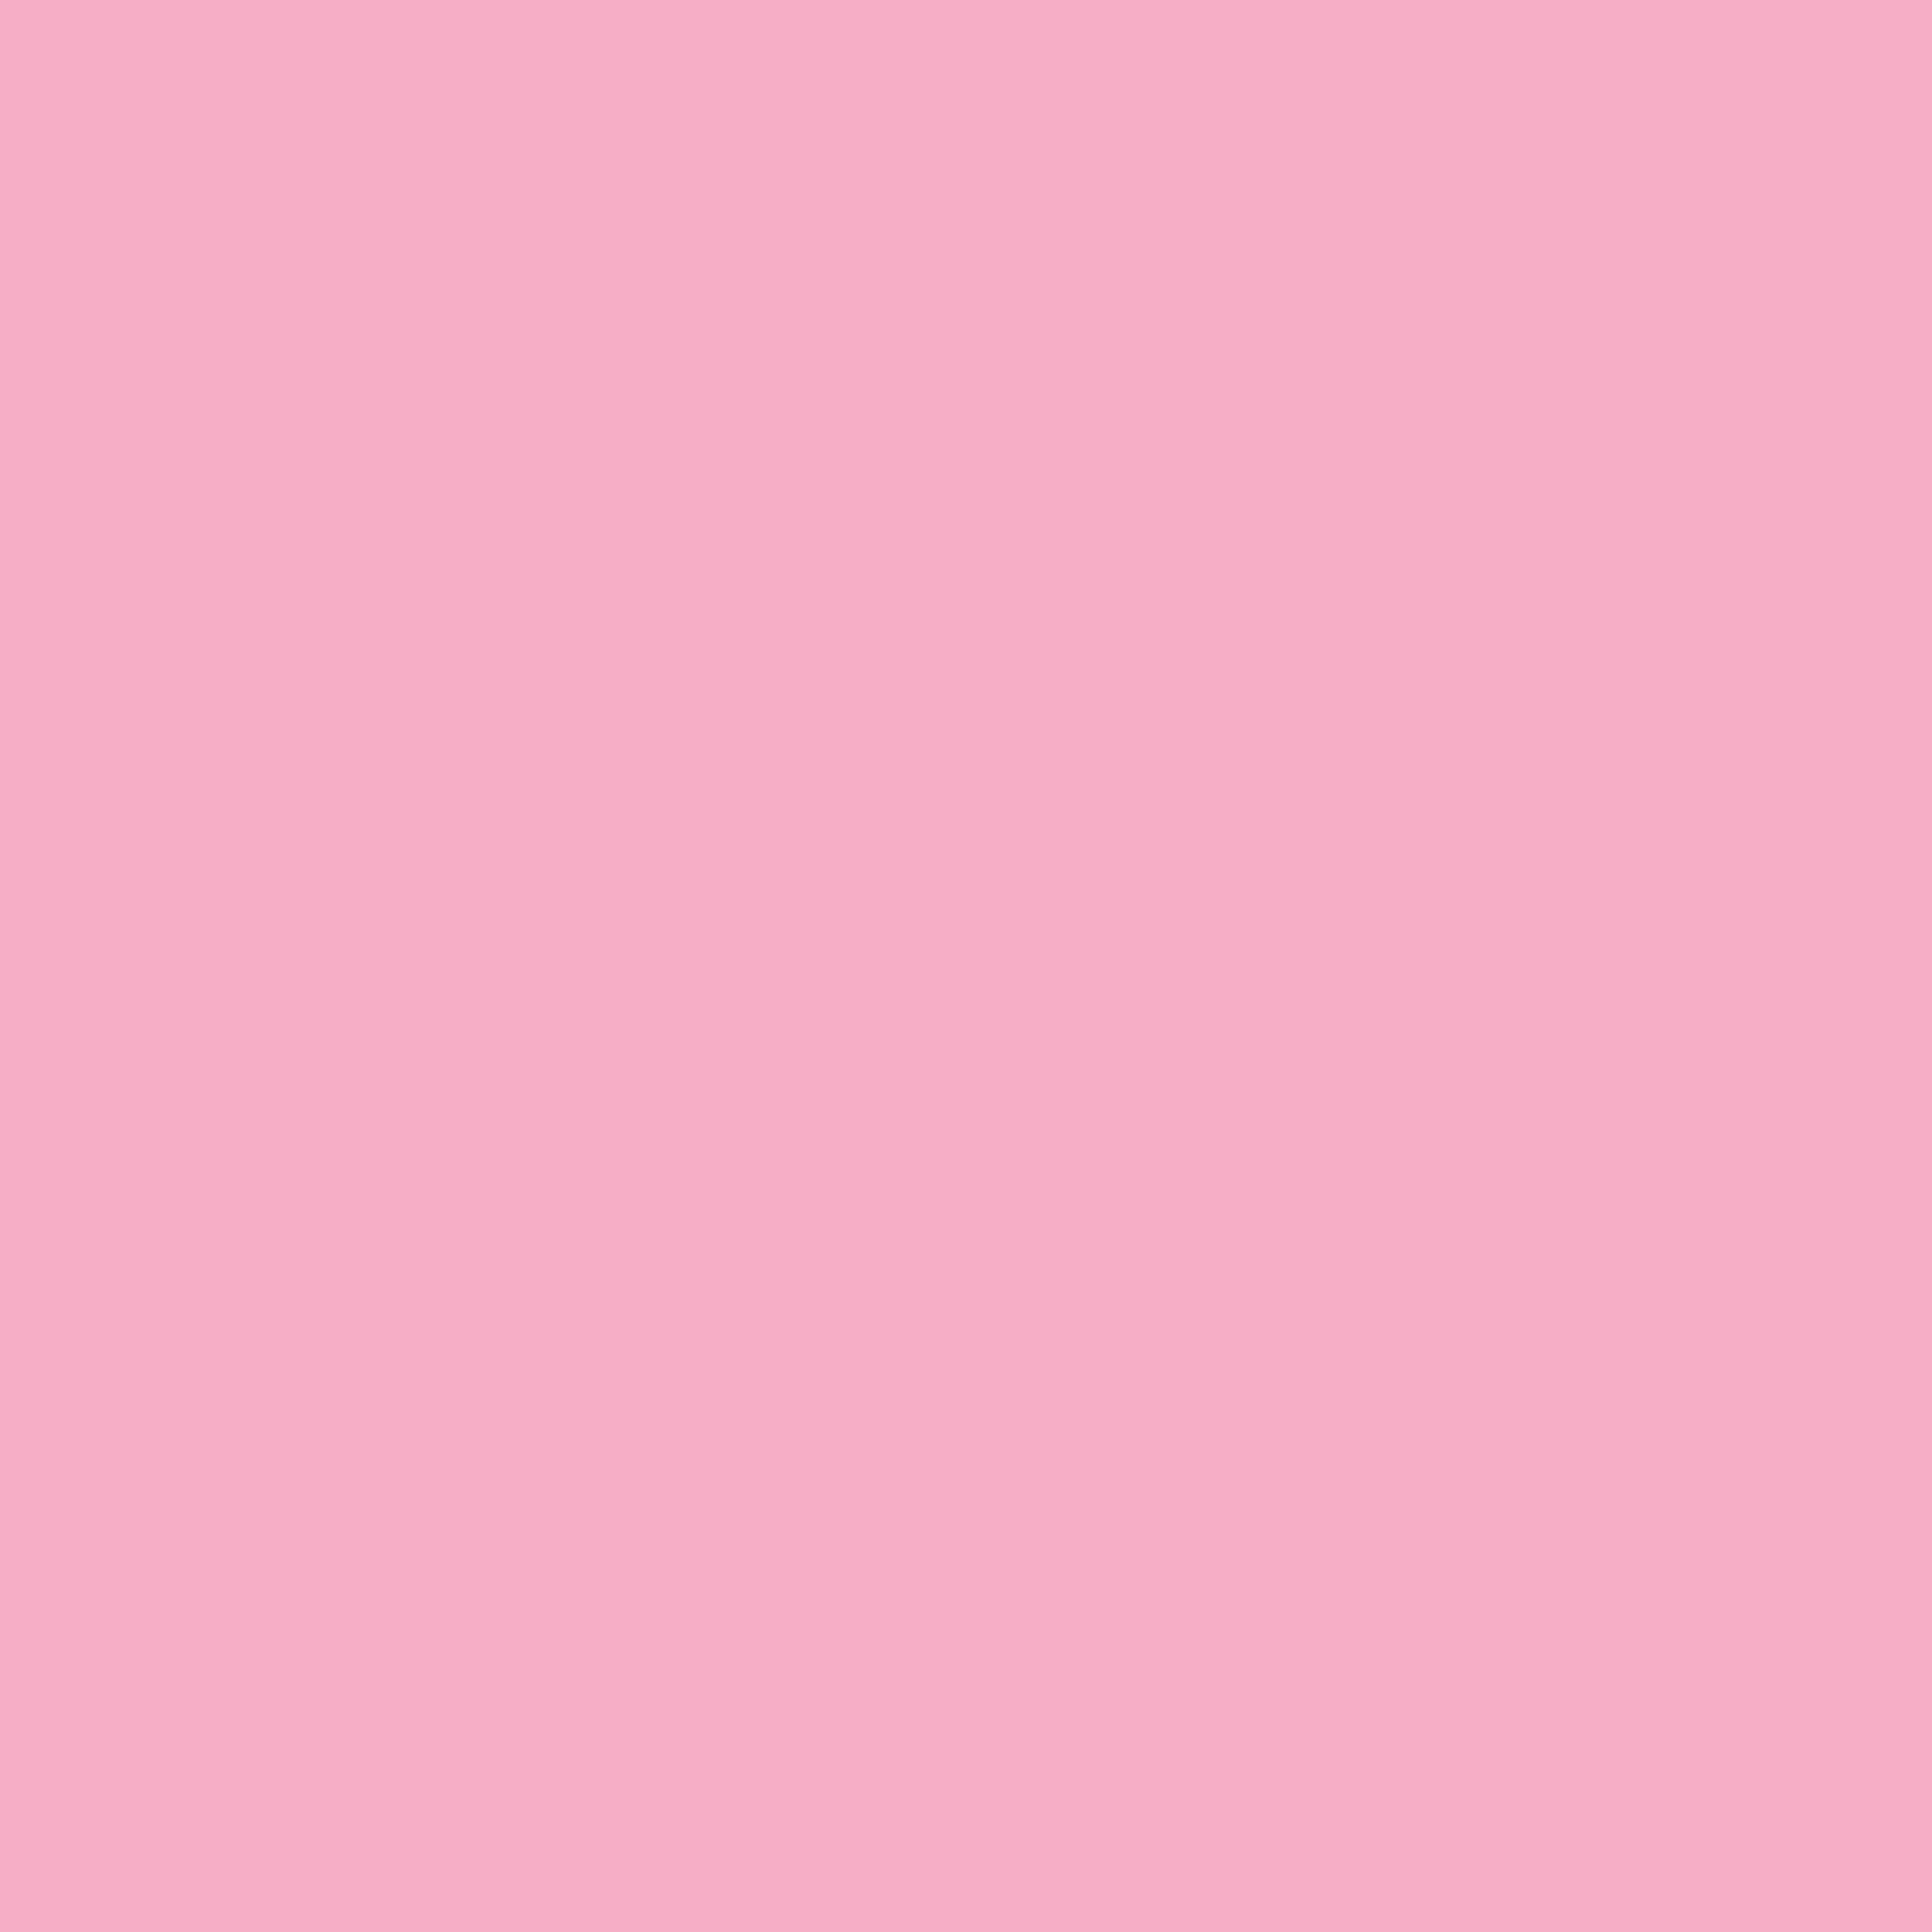 2732x2732 Nadeshiko Pink Solid Color Background